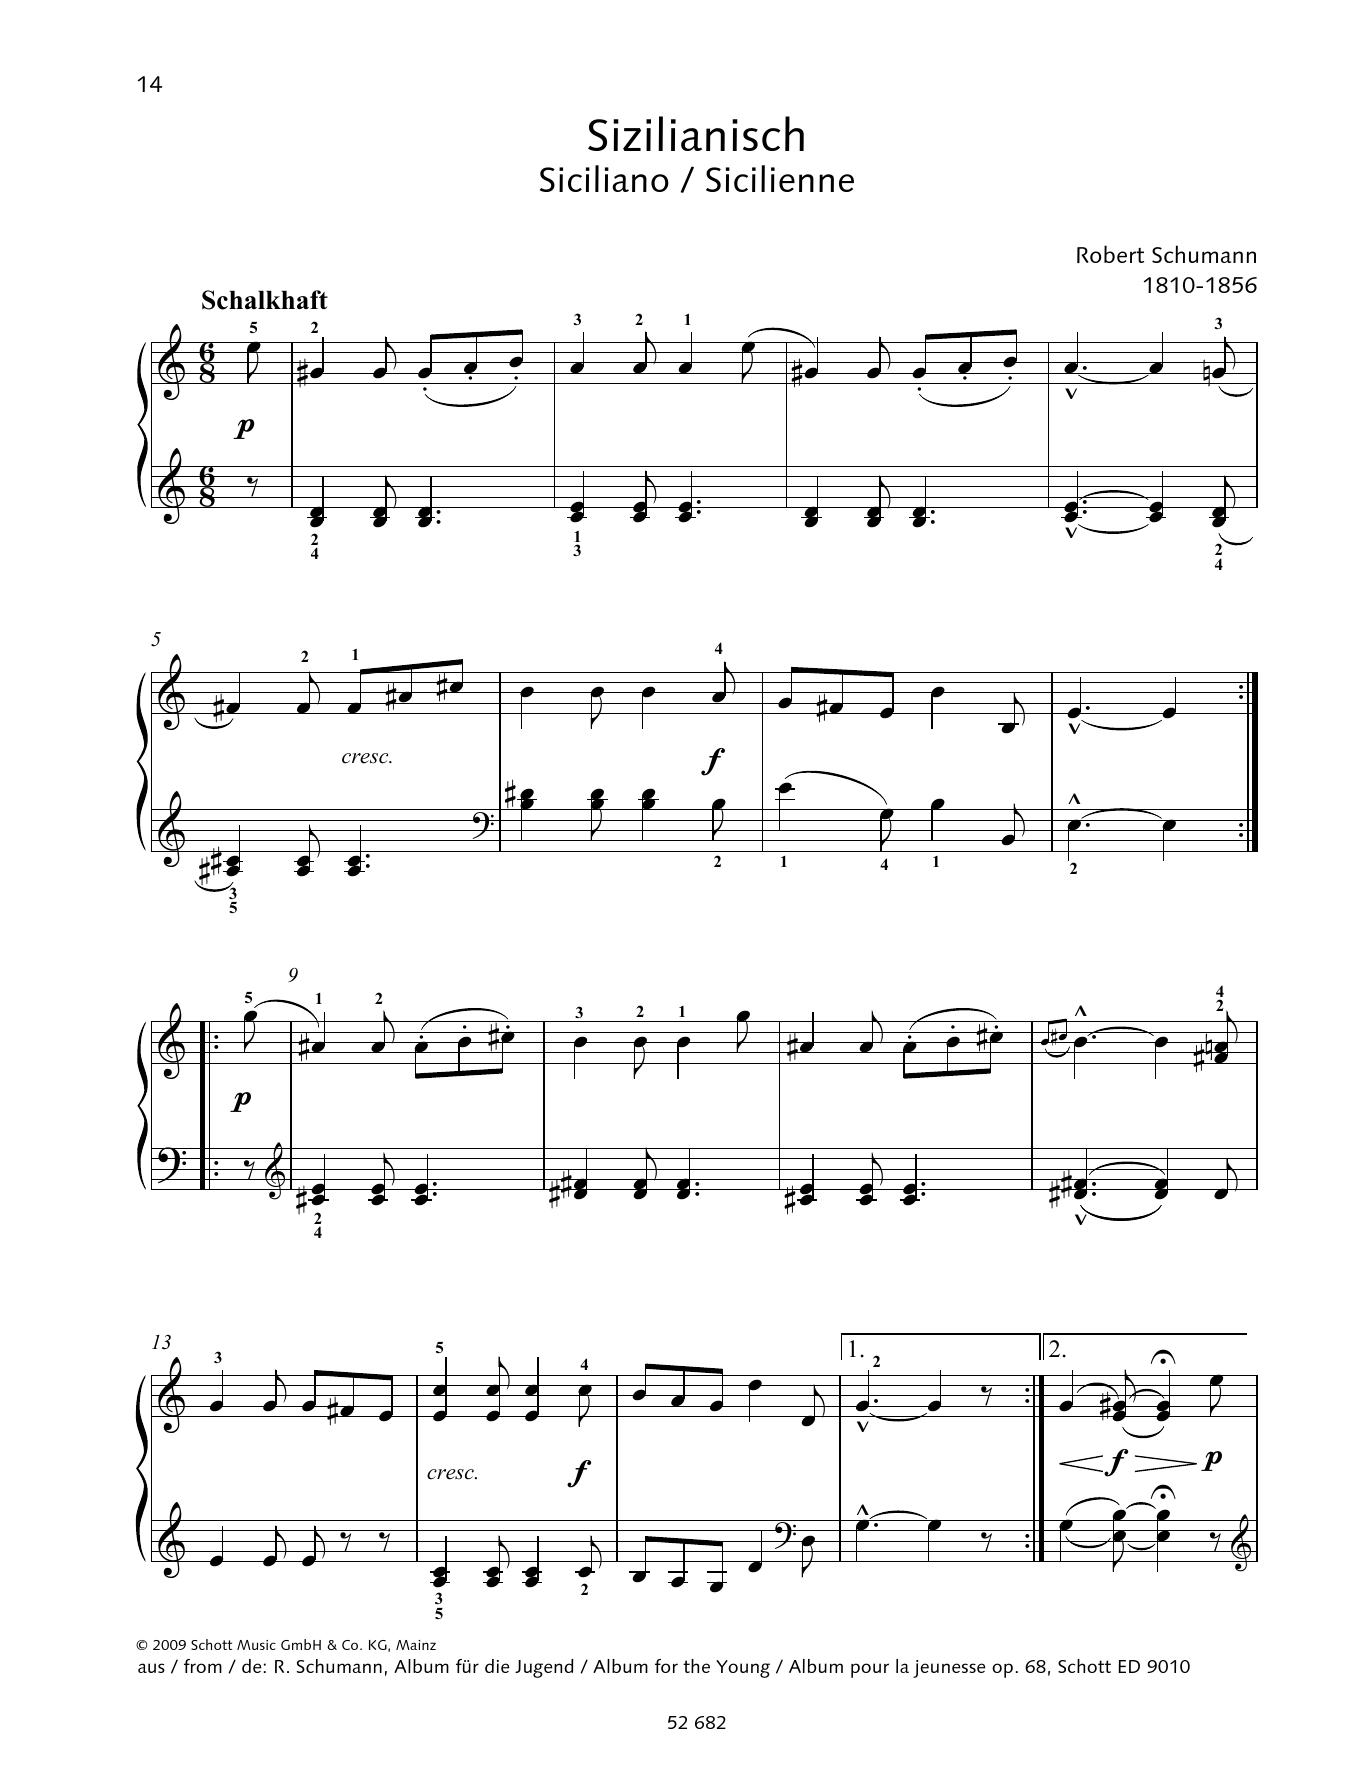 Siciliano Sheet Music